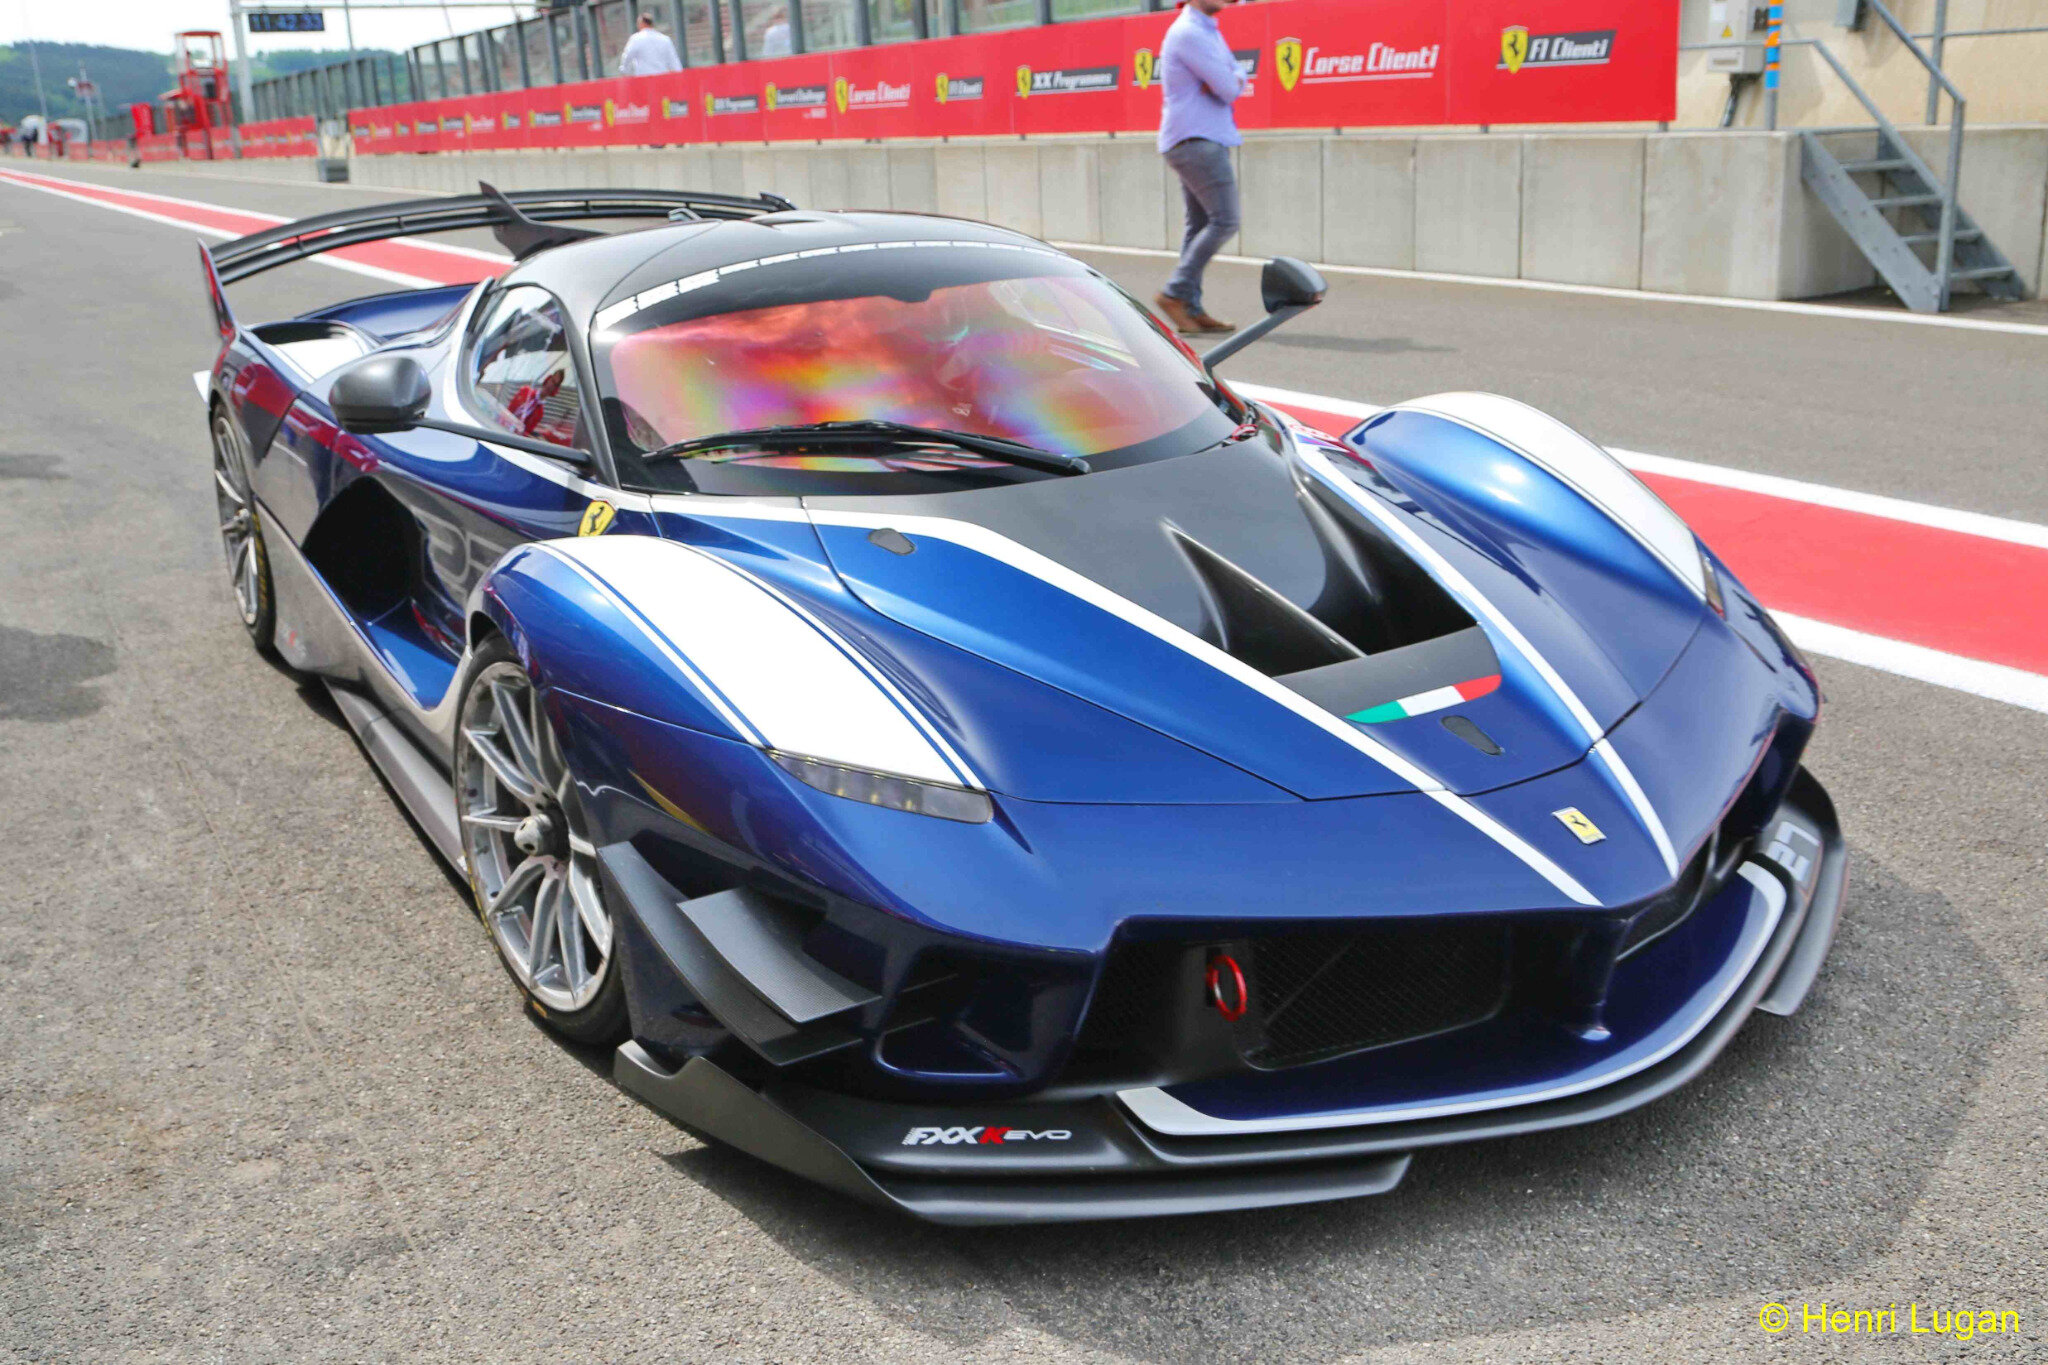 Ferrari FXX K evo n°27 #211251_02 - 2014 [I] HL_GF